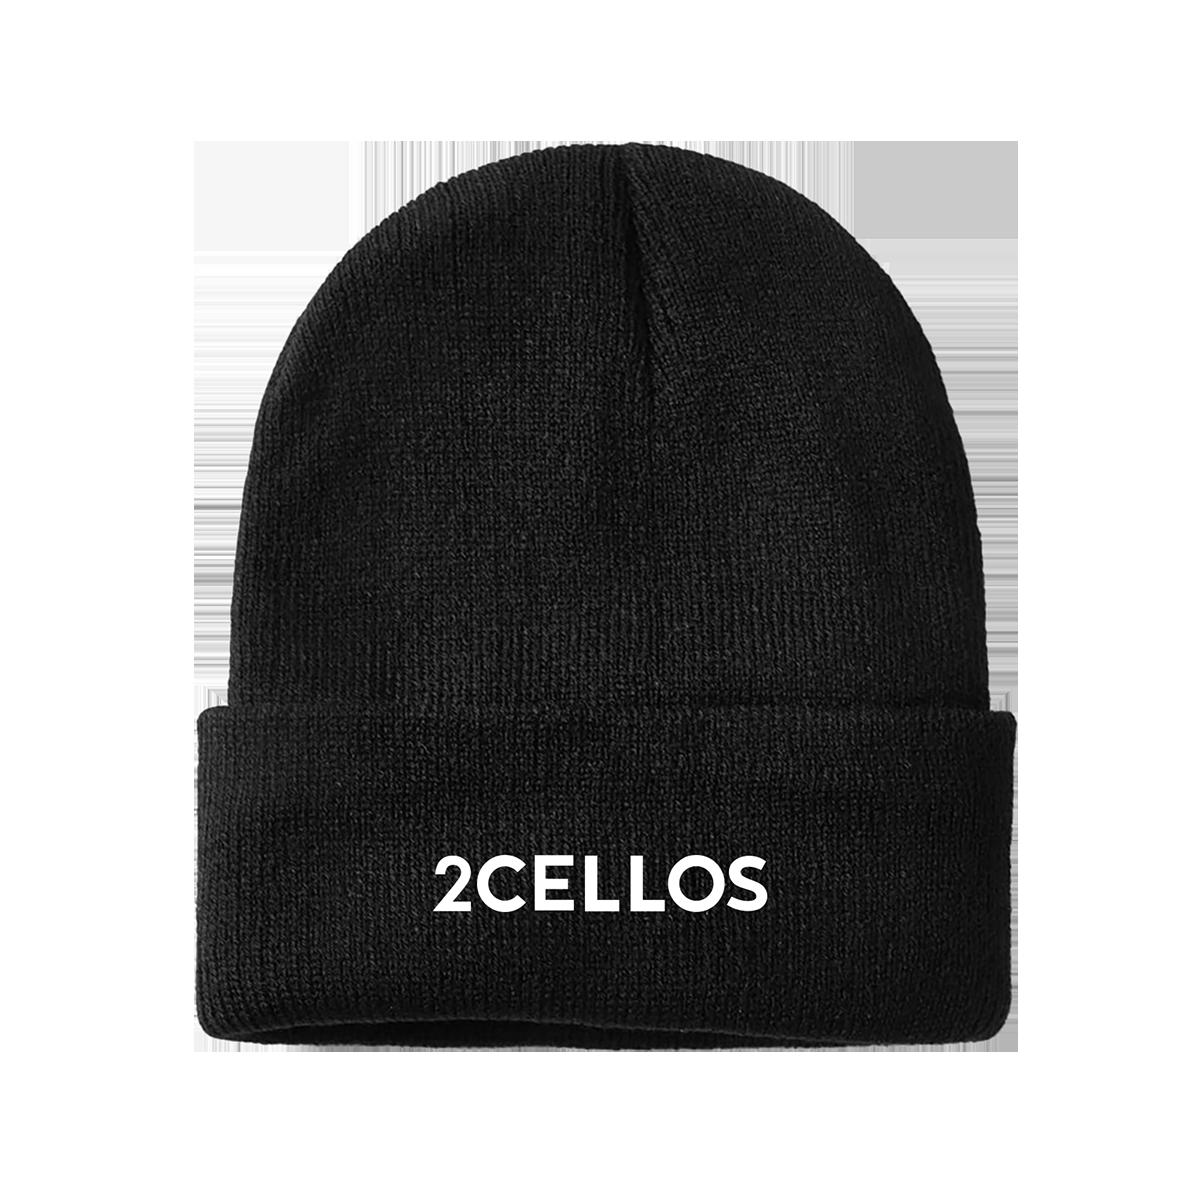 Buy Online 2 Cellos - 2CELLOS Black Beanie